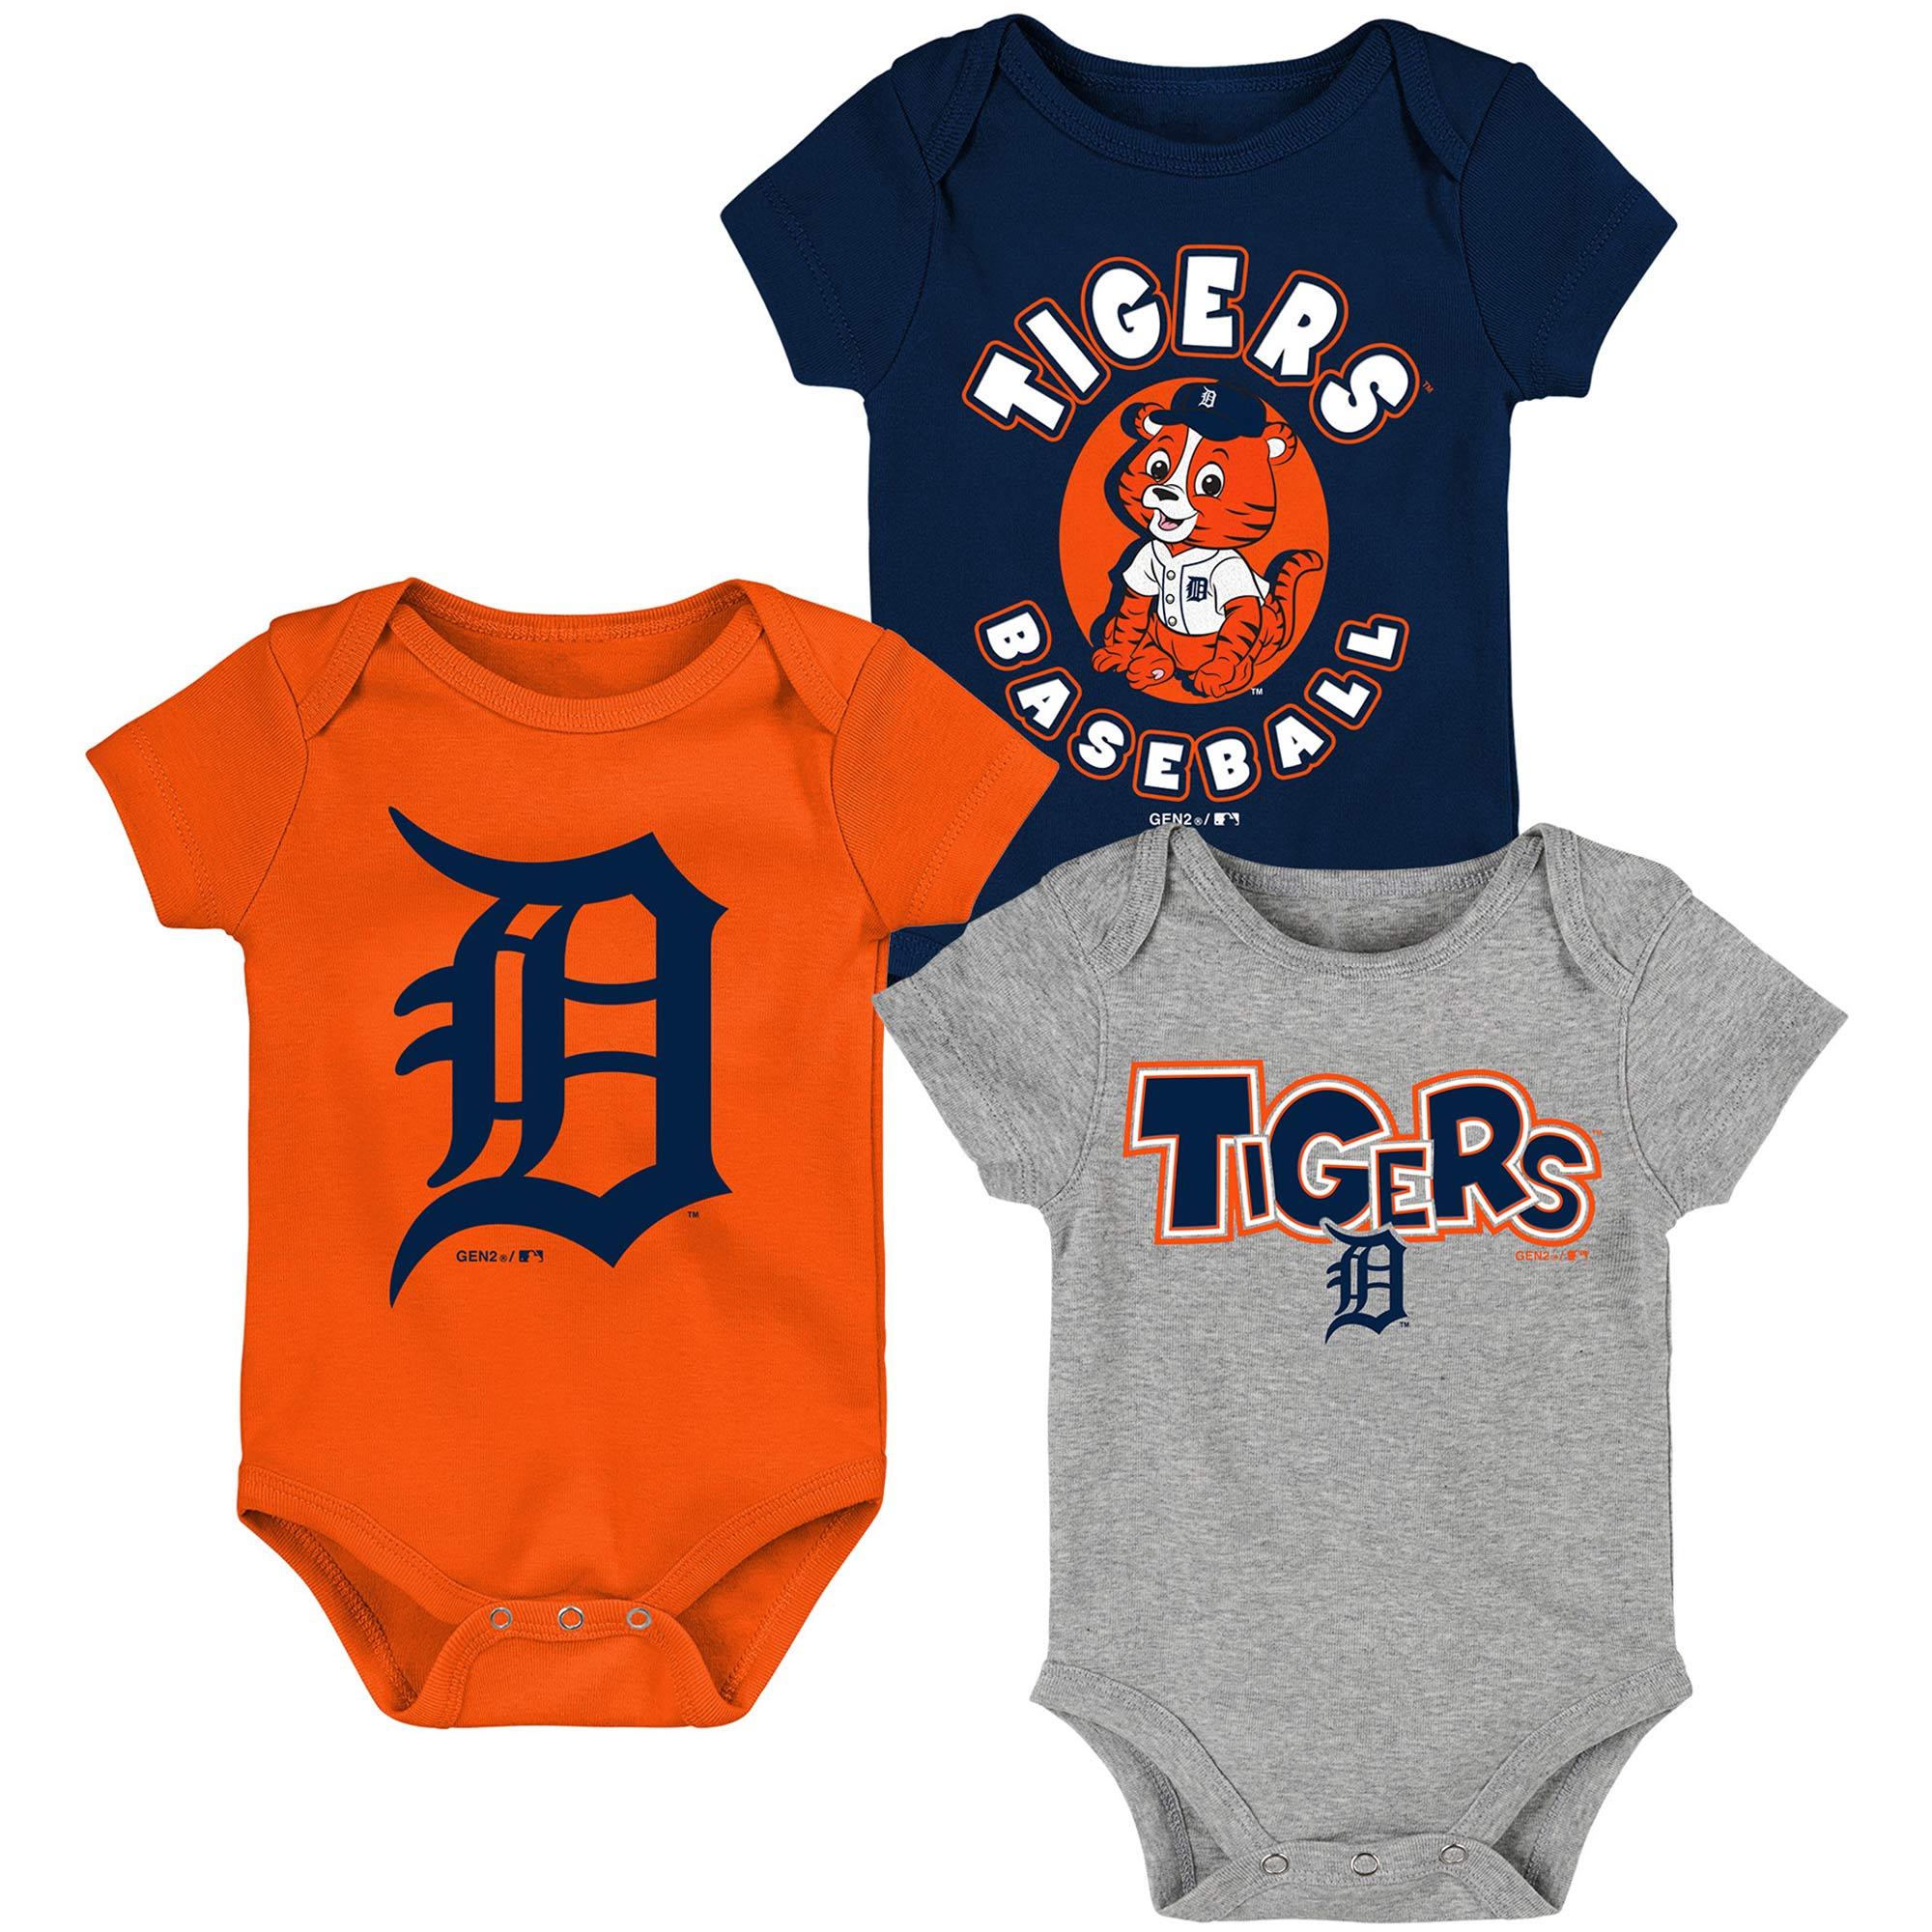 Detroit Tigers Newborn & Infant Everyday Fan Three-Pack Bodysuit Set - Navy/Orange/Heathered Gray